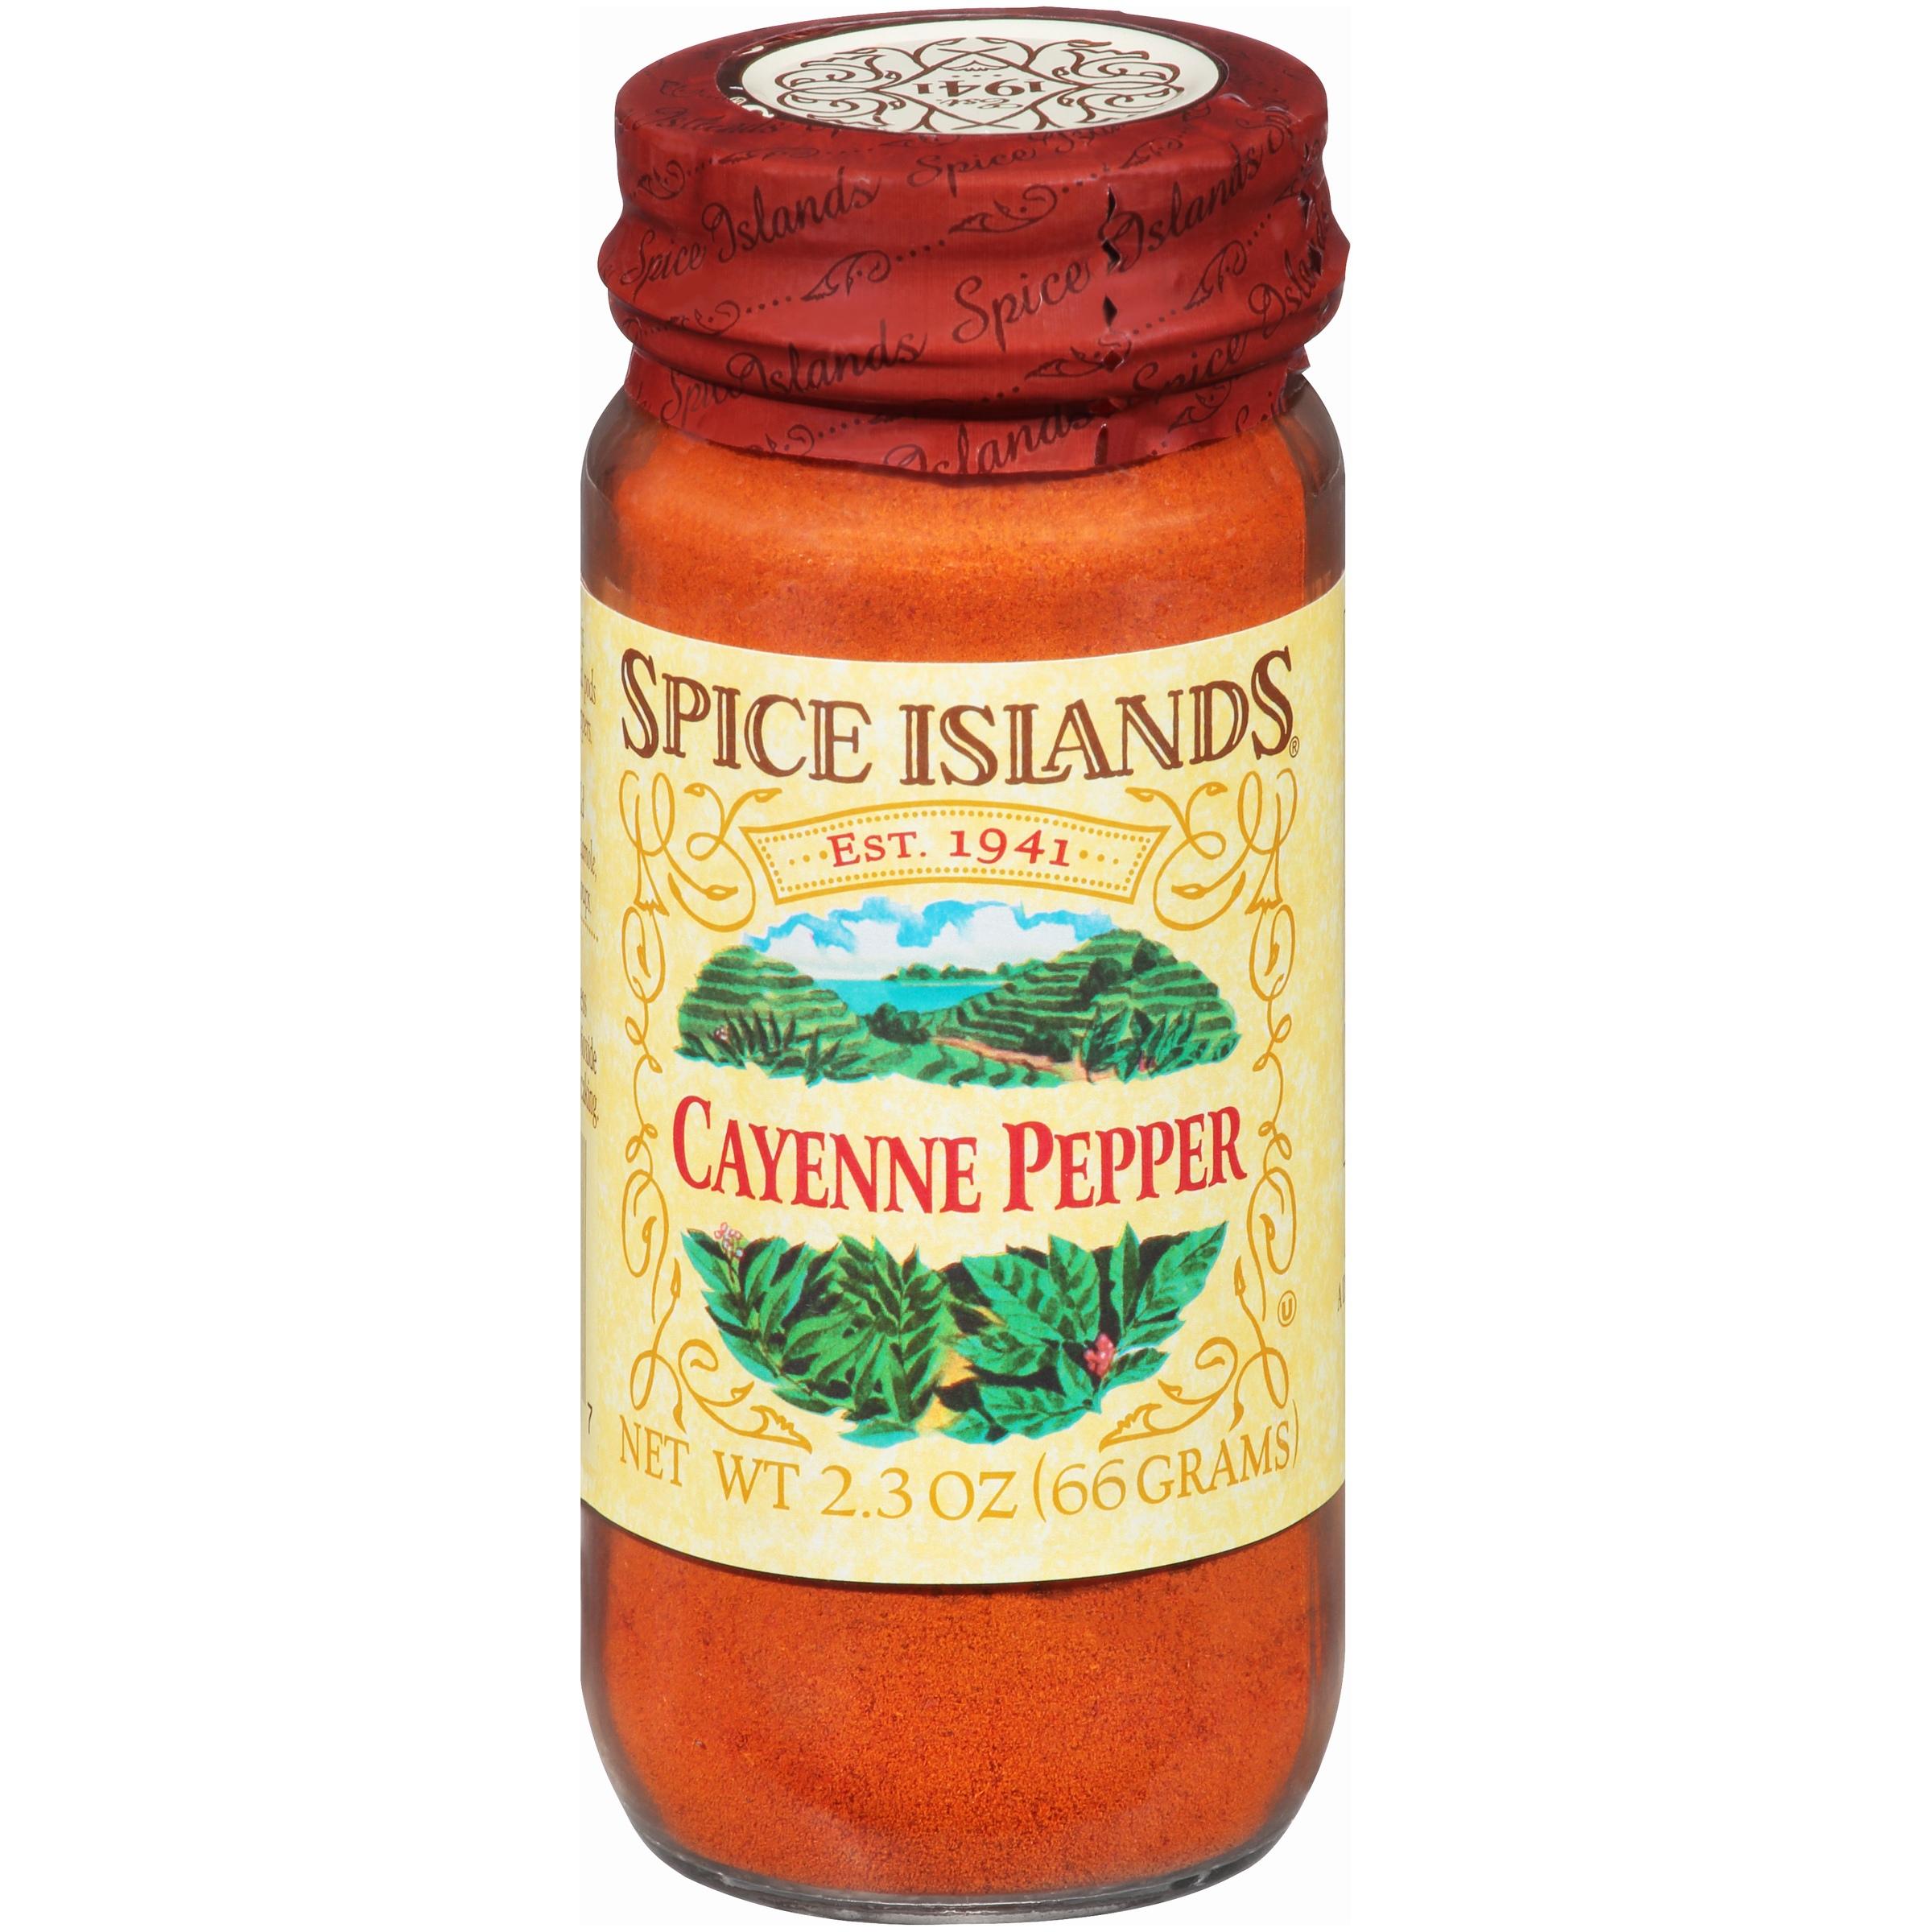 Spice Islands® Cayenne Pepper 2.3 oz. Jar